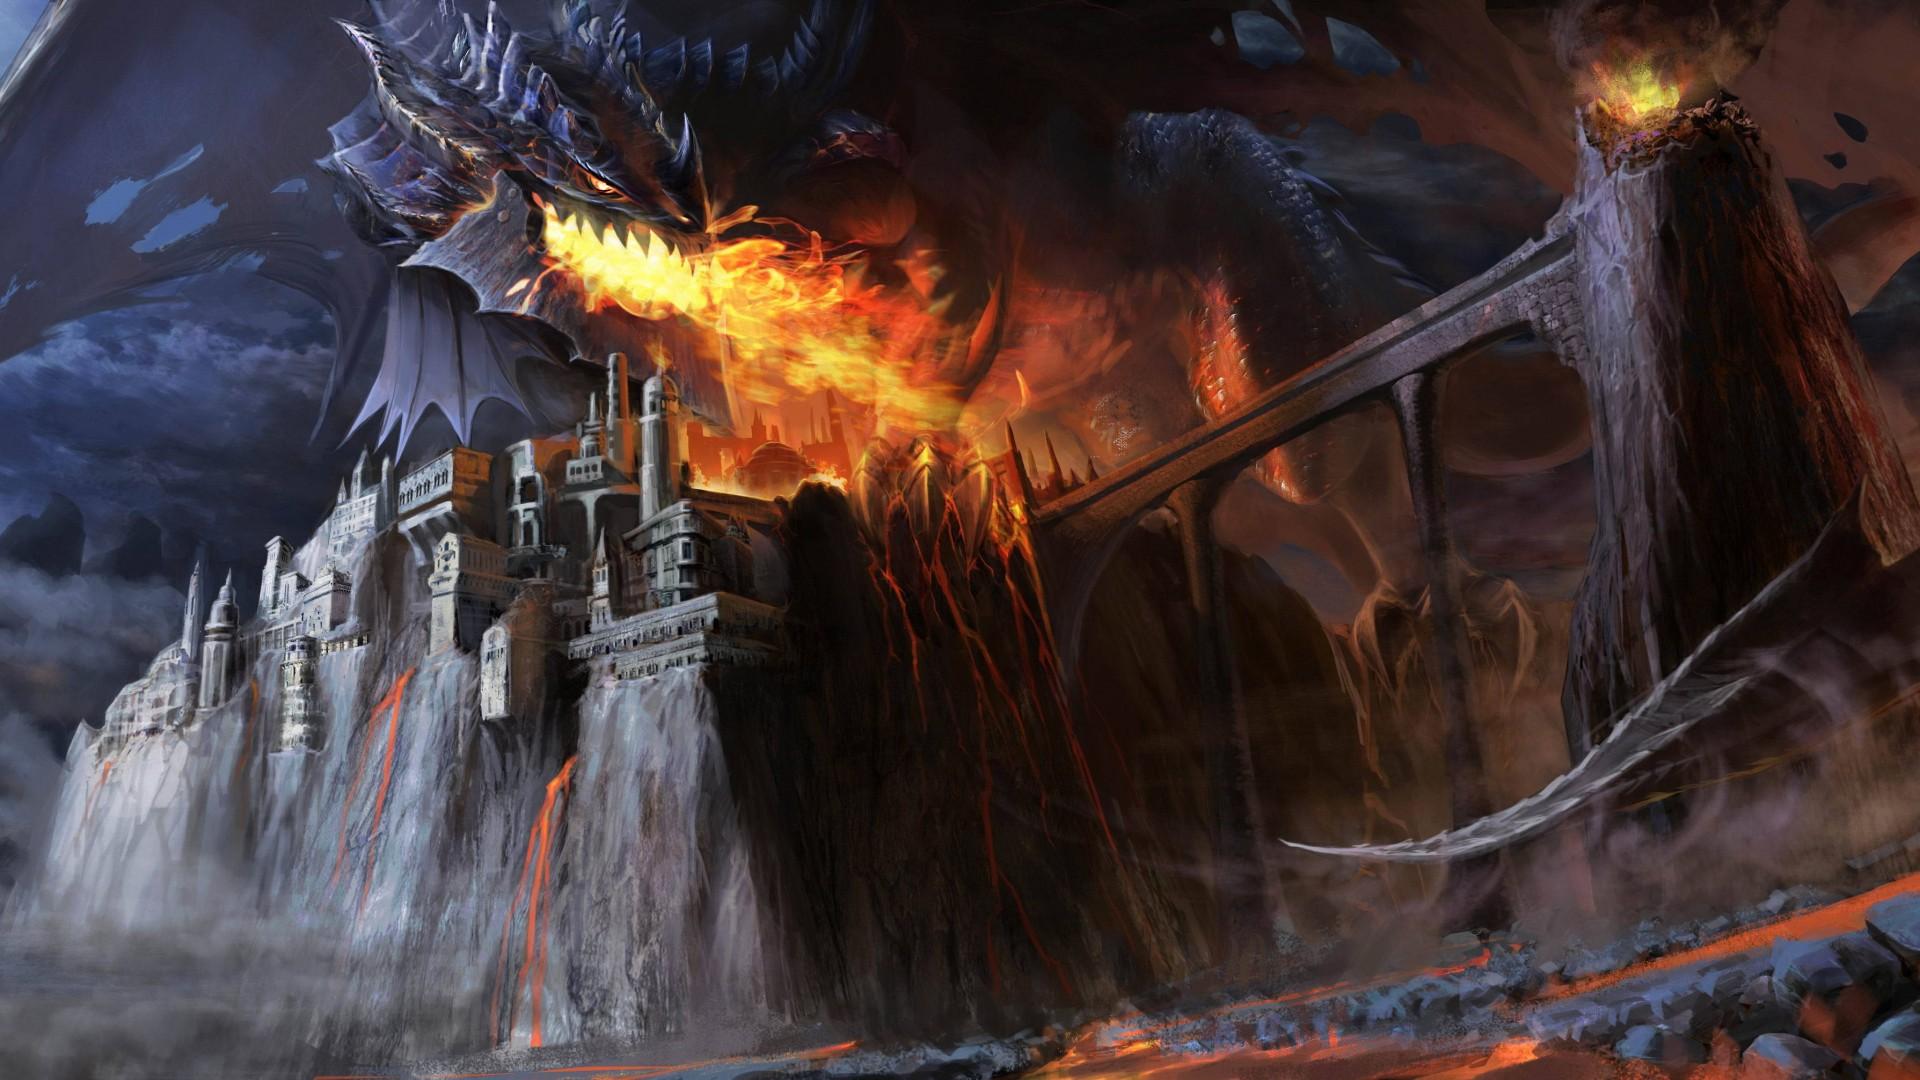 Iphone Wallpaper Skull Wallpaper Dragon Black Fire Castle Bridge Lava Smoke